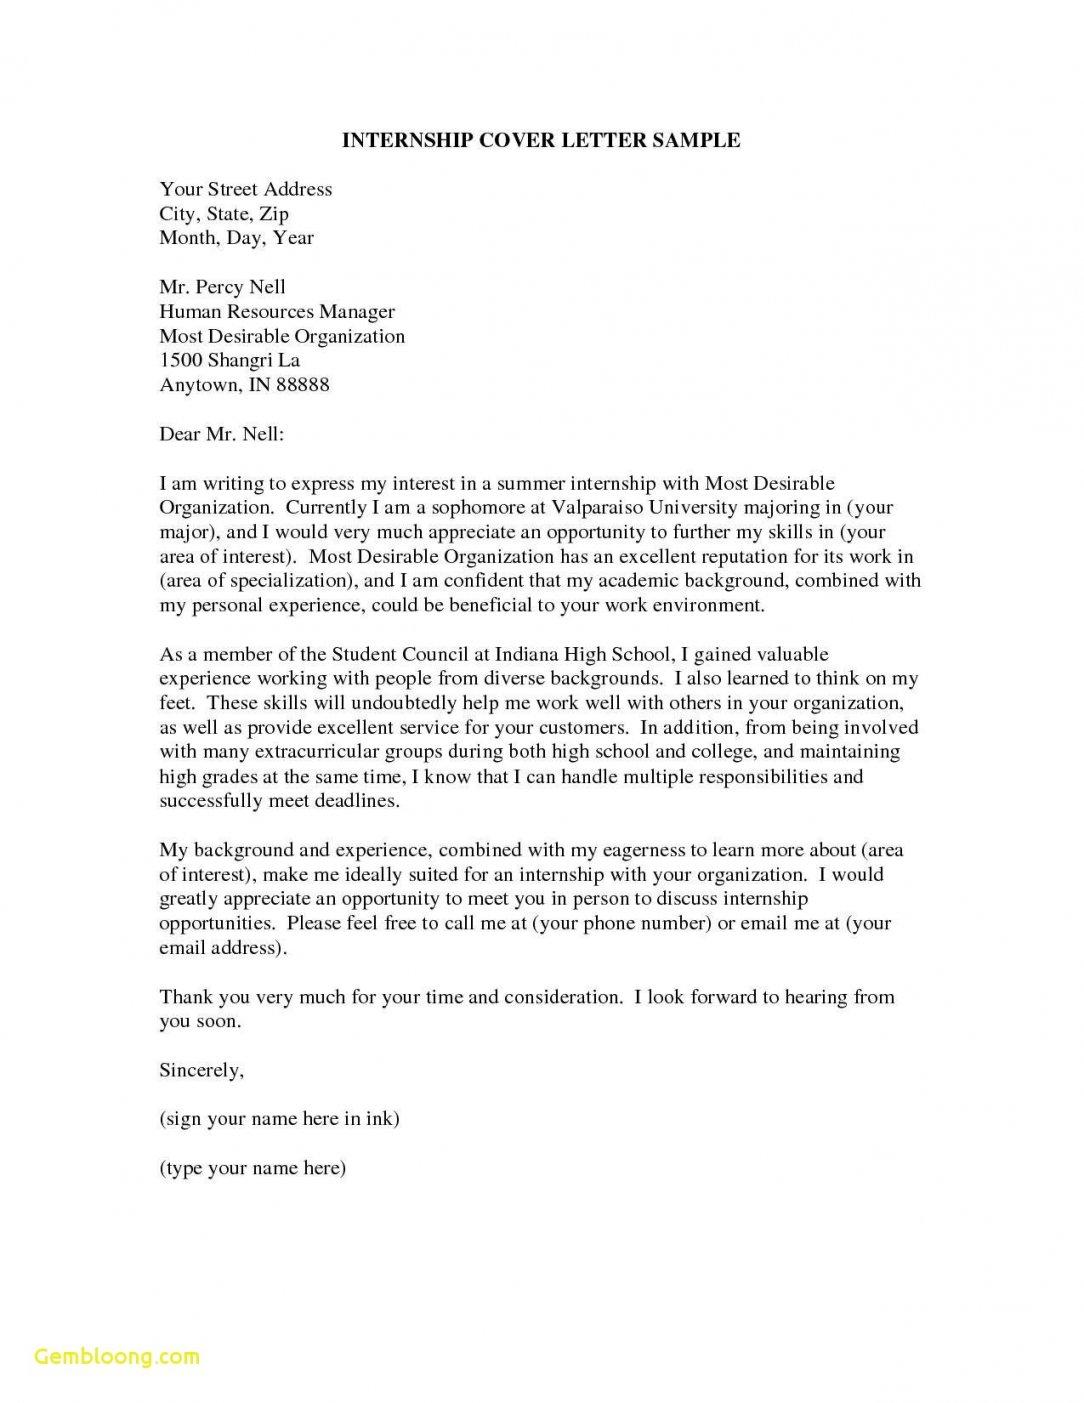 Cover Letter Template Internship